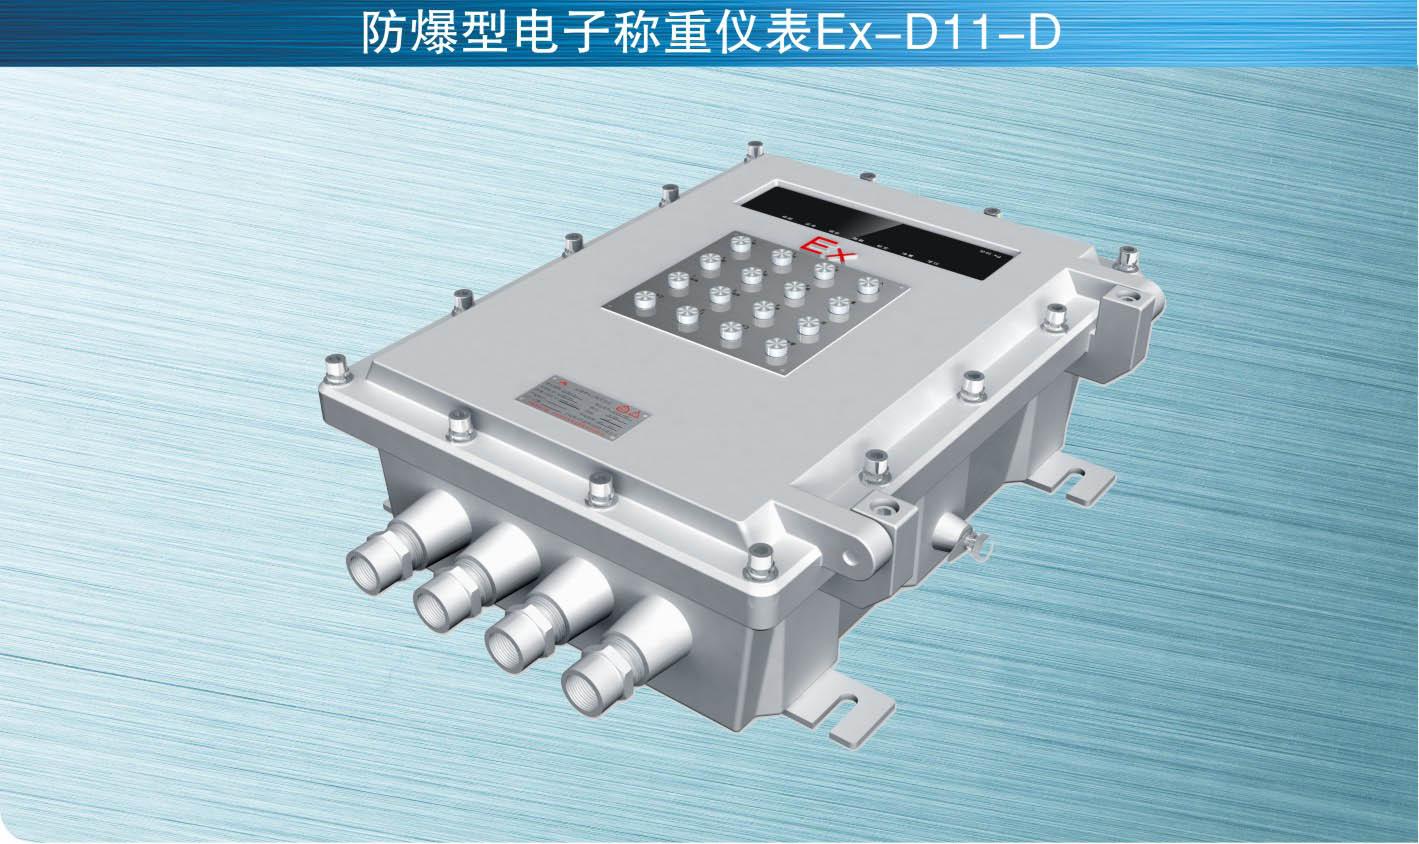 Ex-D11-D防爆型电子称重仪表-宁波柯力